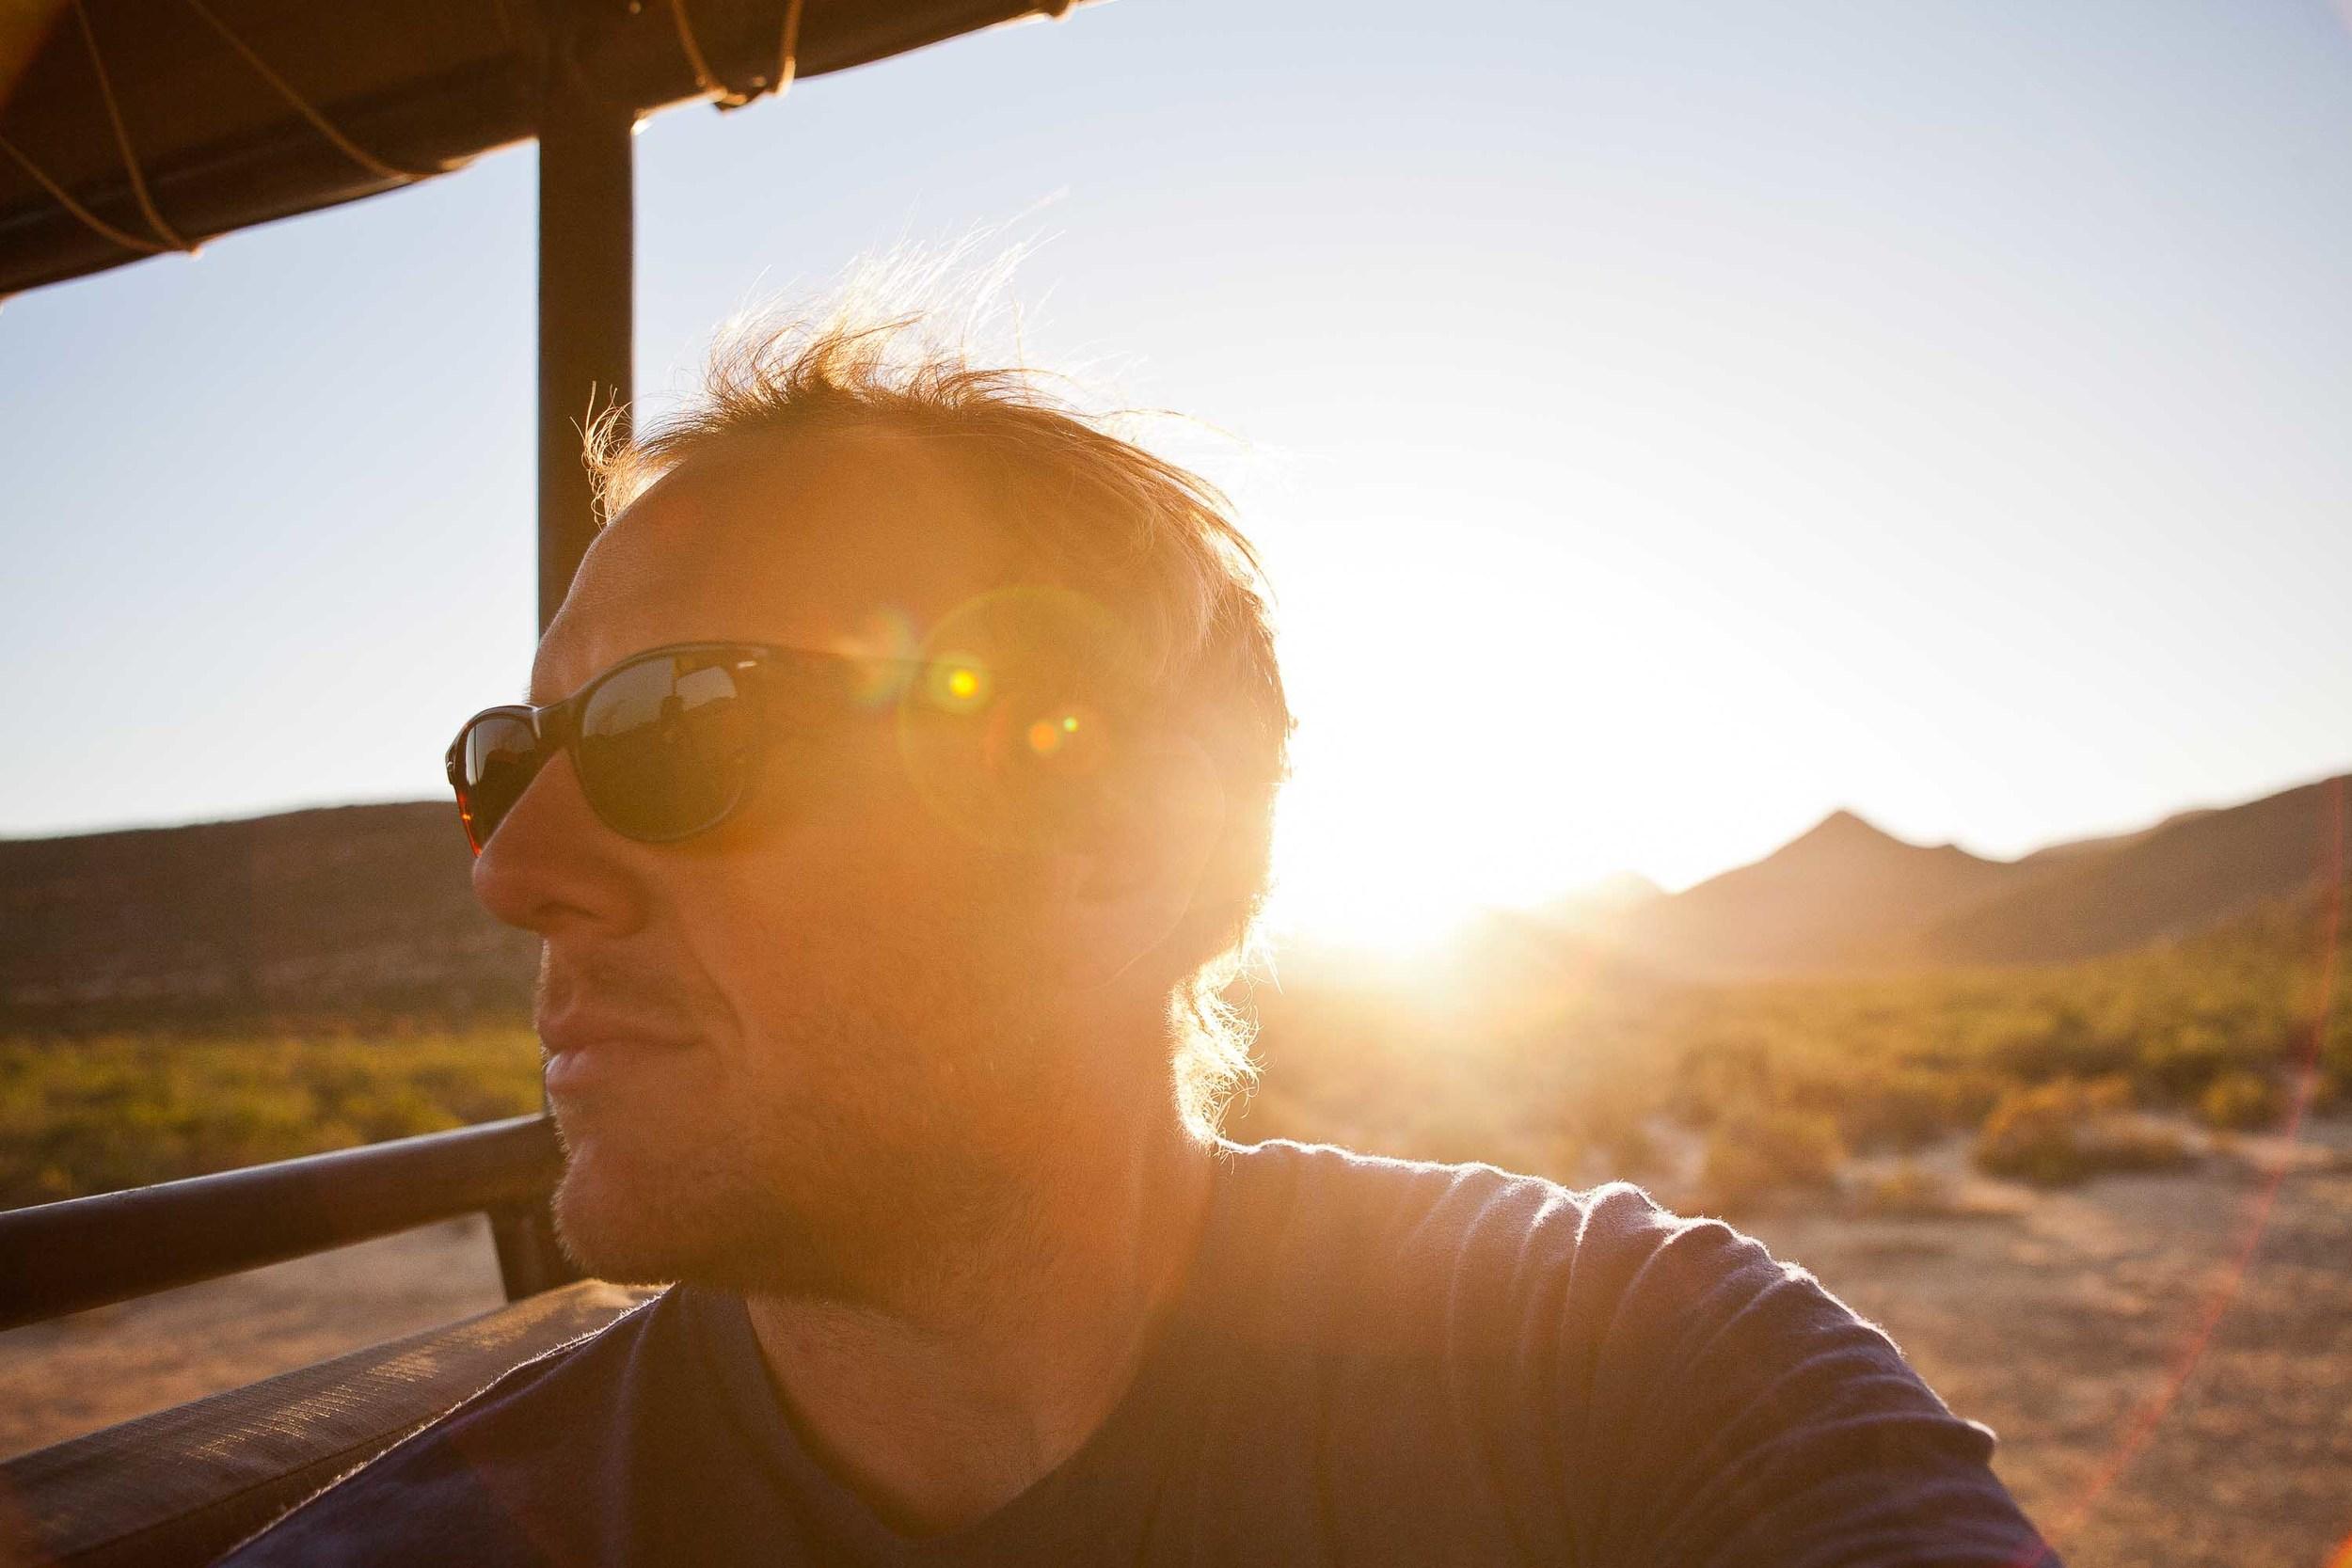 bryce-johnson-photography-actor-world-travel-explorer-photo-55.jpg